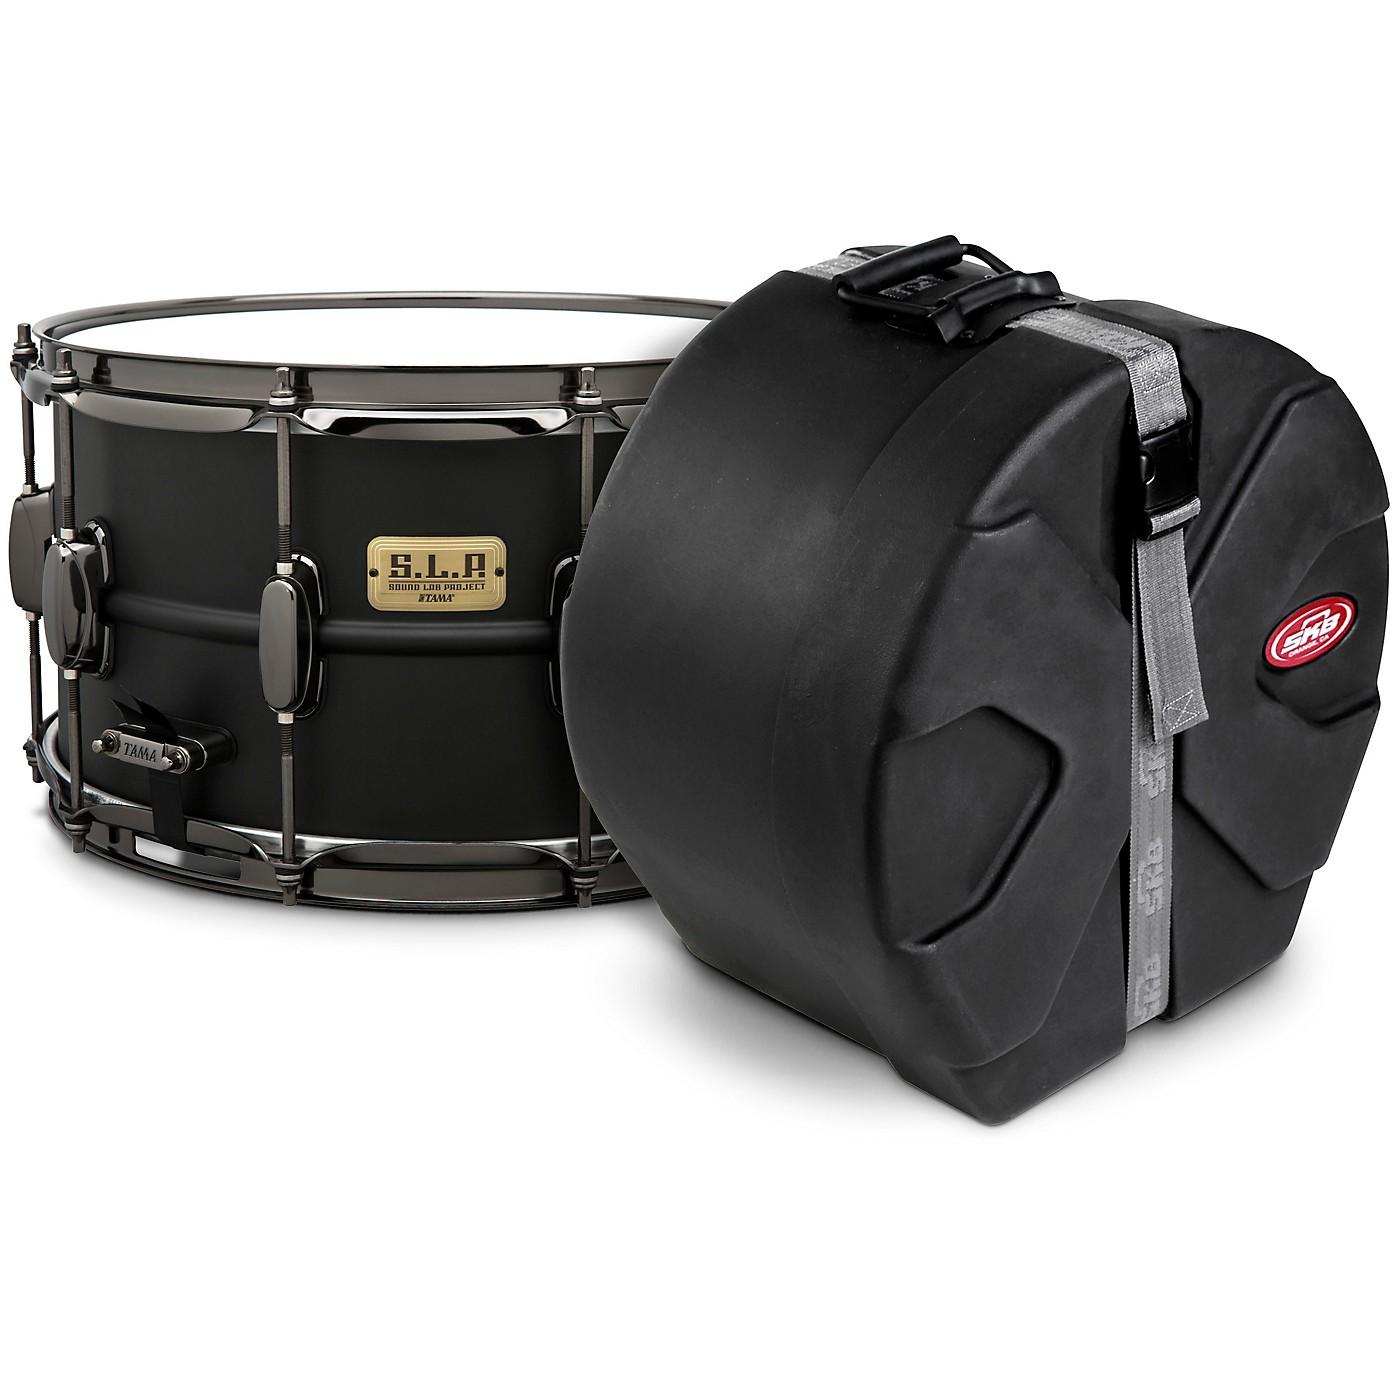 TAMA S.L.P. Big Black Steel Snare Drum with SKB Case thumbnail